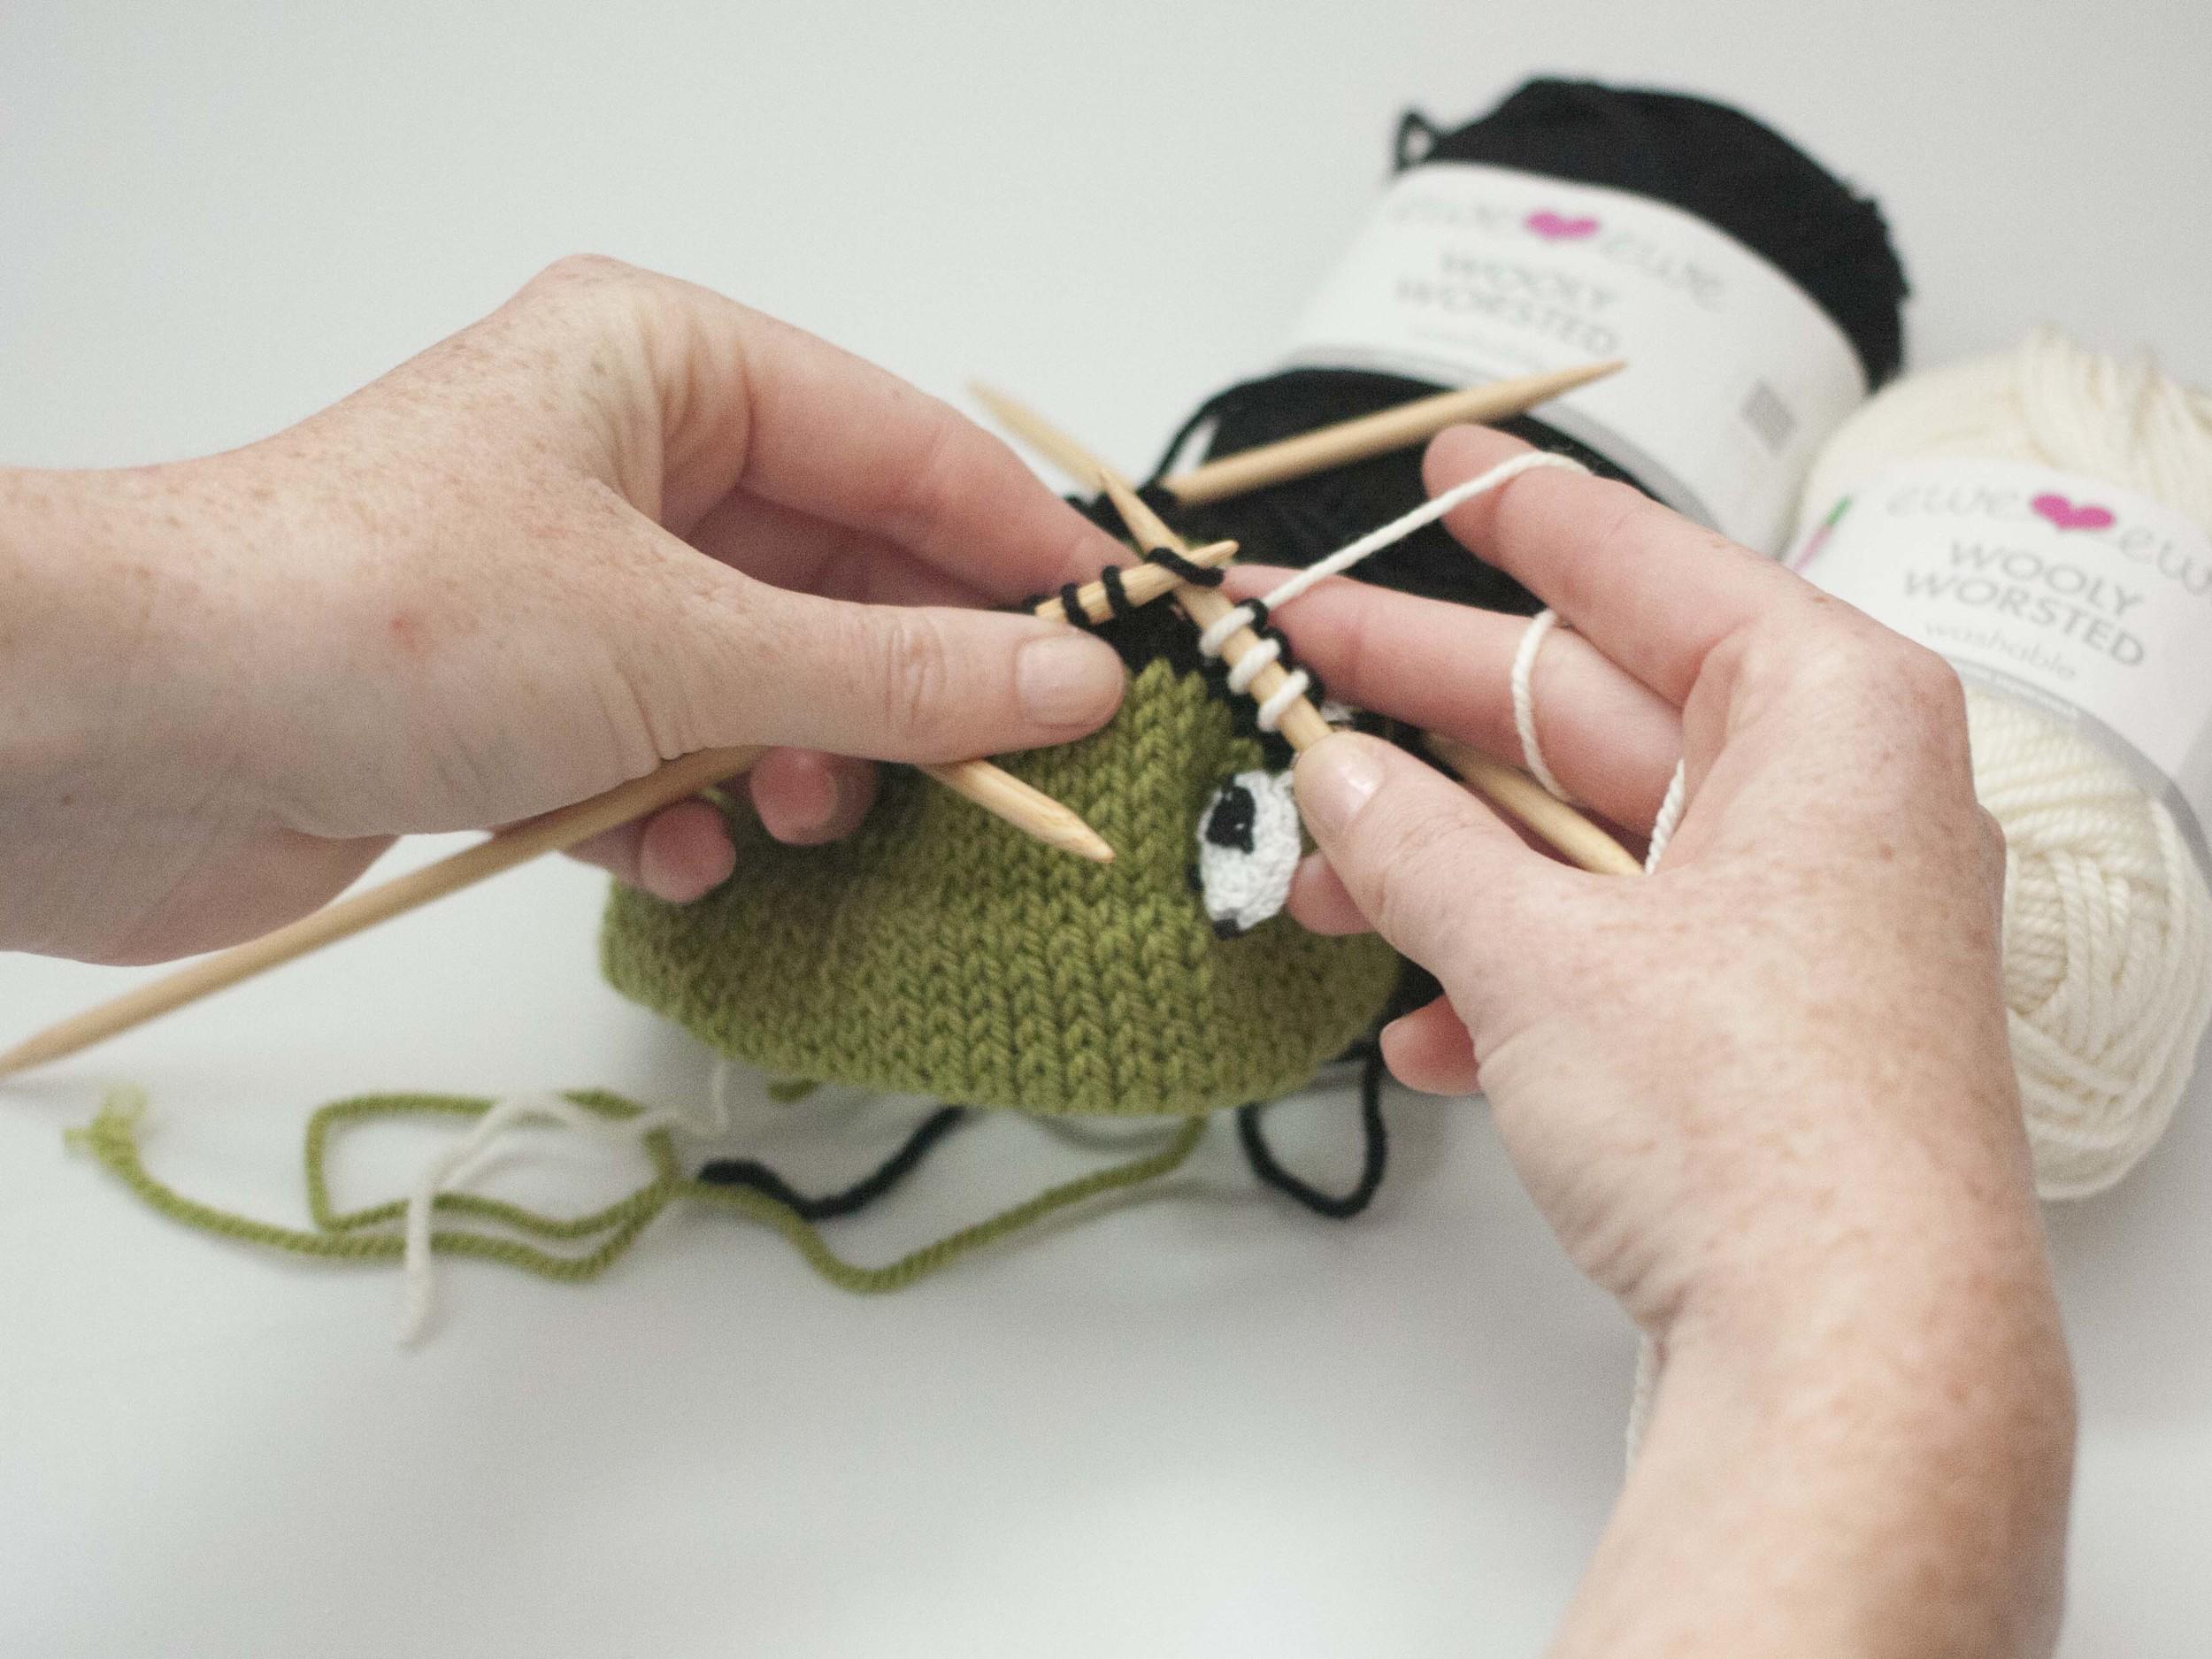 adding stripes to knitting